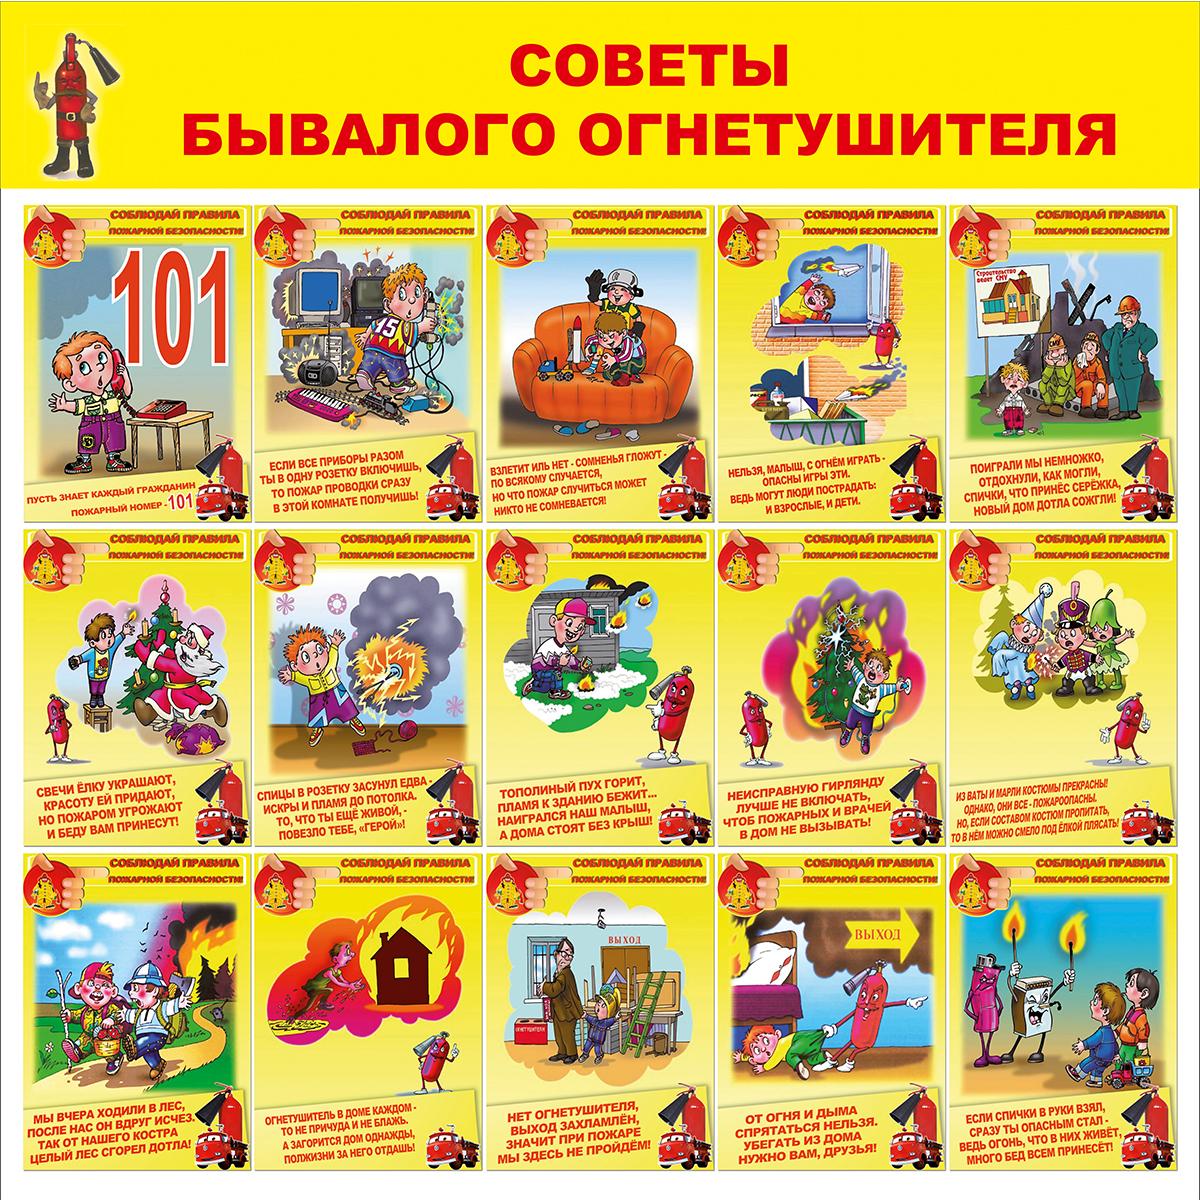 плакат Советы бывалого огнетушителя  1000х1000 мм